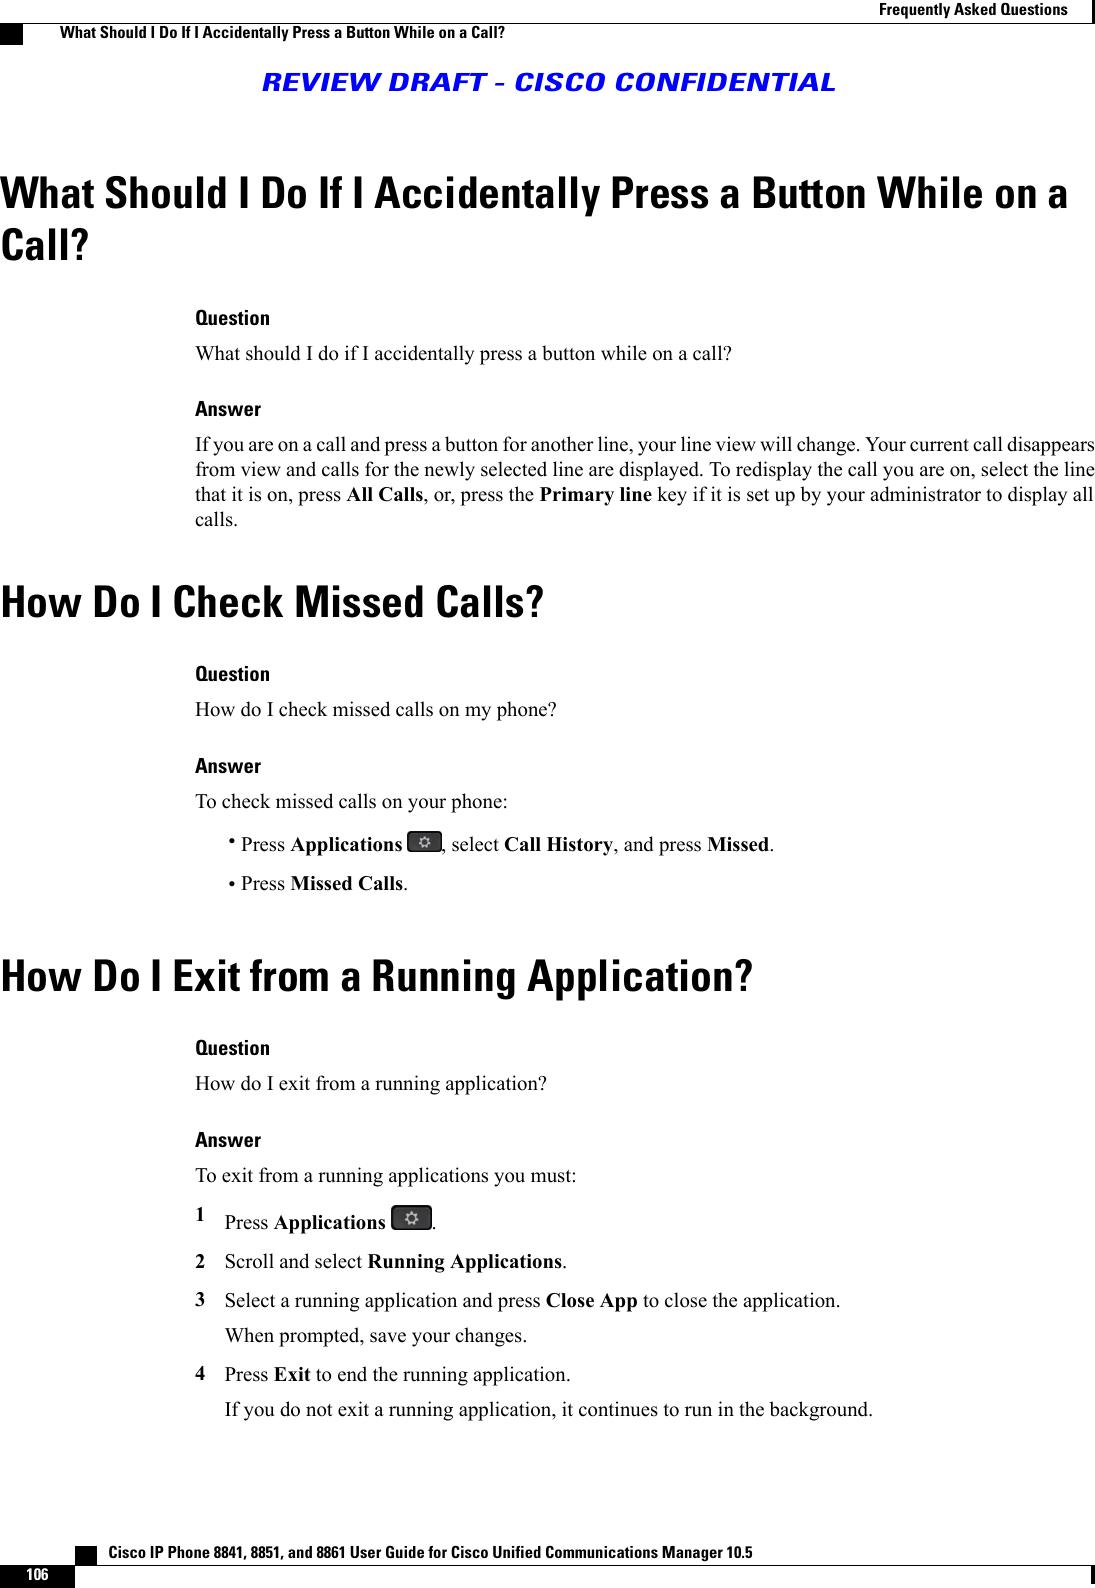 Cisco Systems 88611057 Cisco IP Phone User Manual